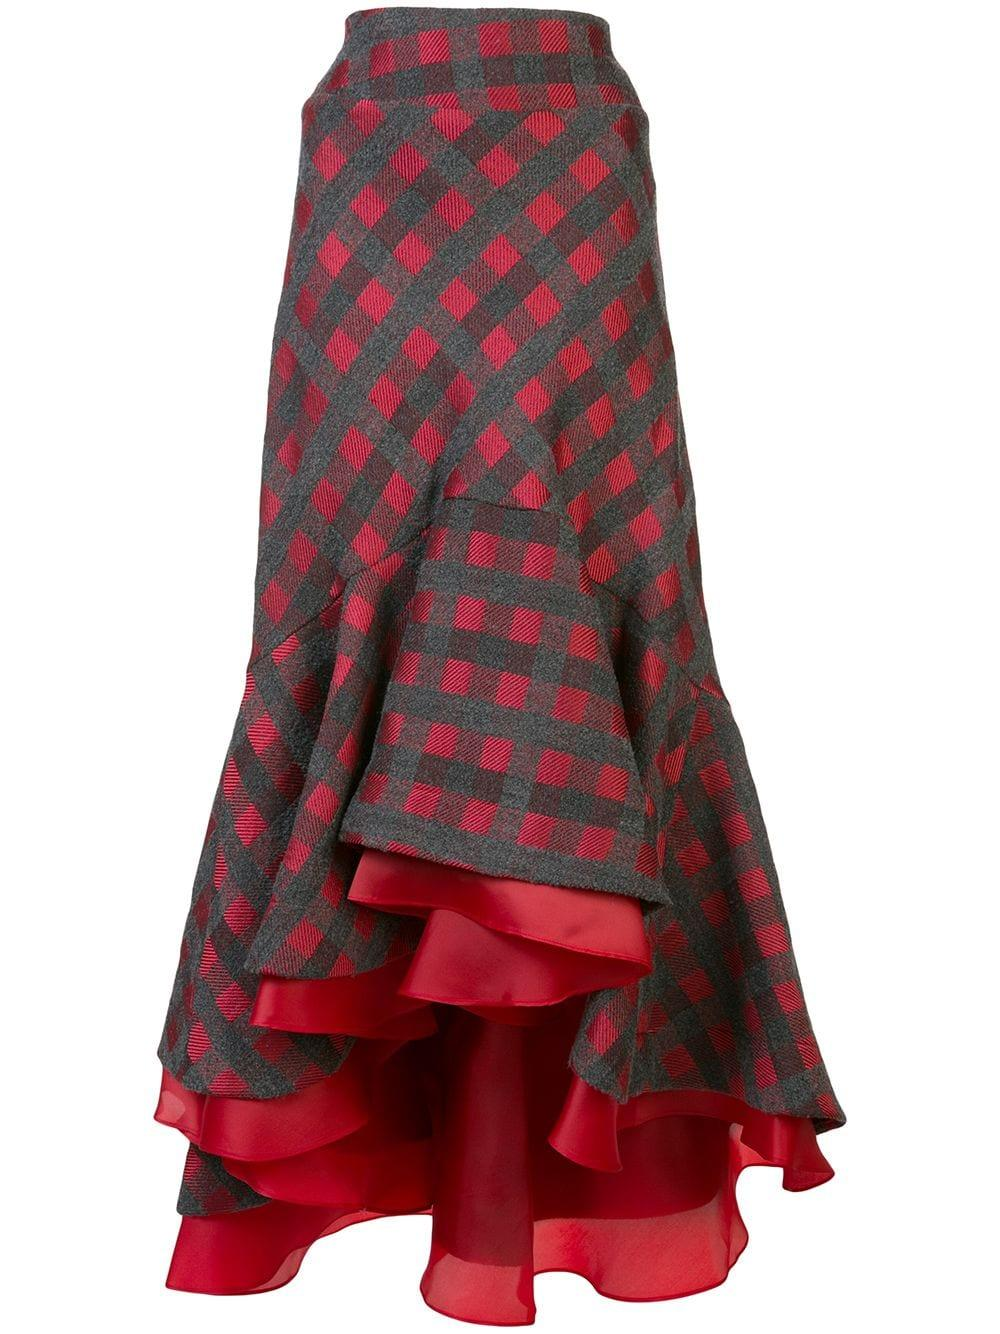 Checked Ruffle Hilo Skirt Item # DALLAS-SKIRT